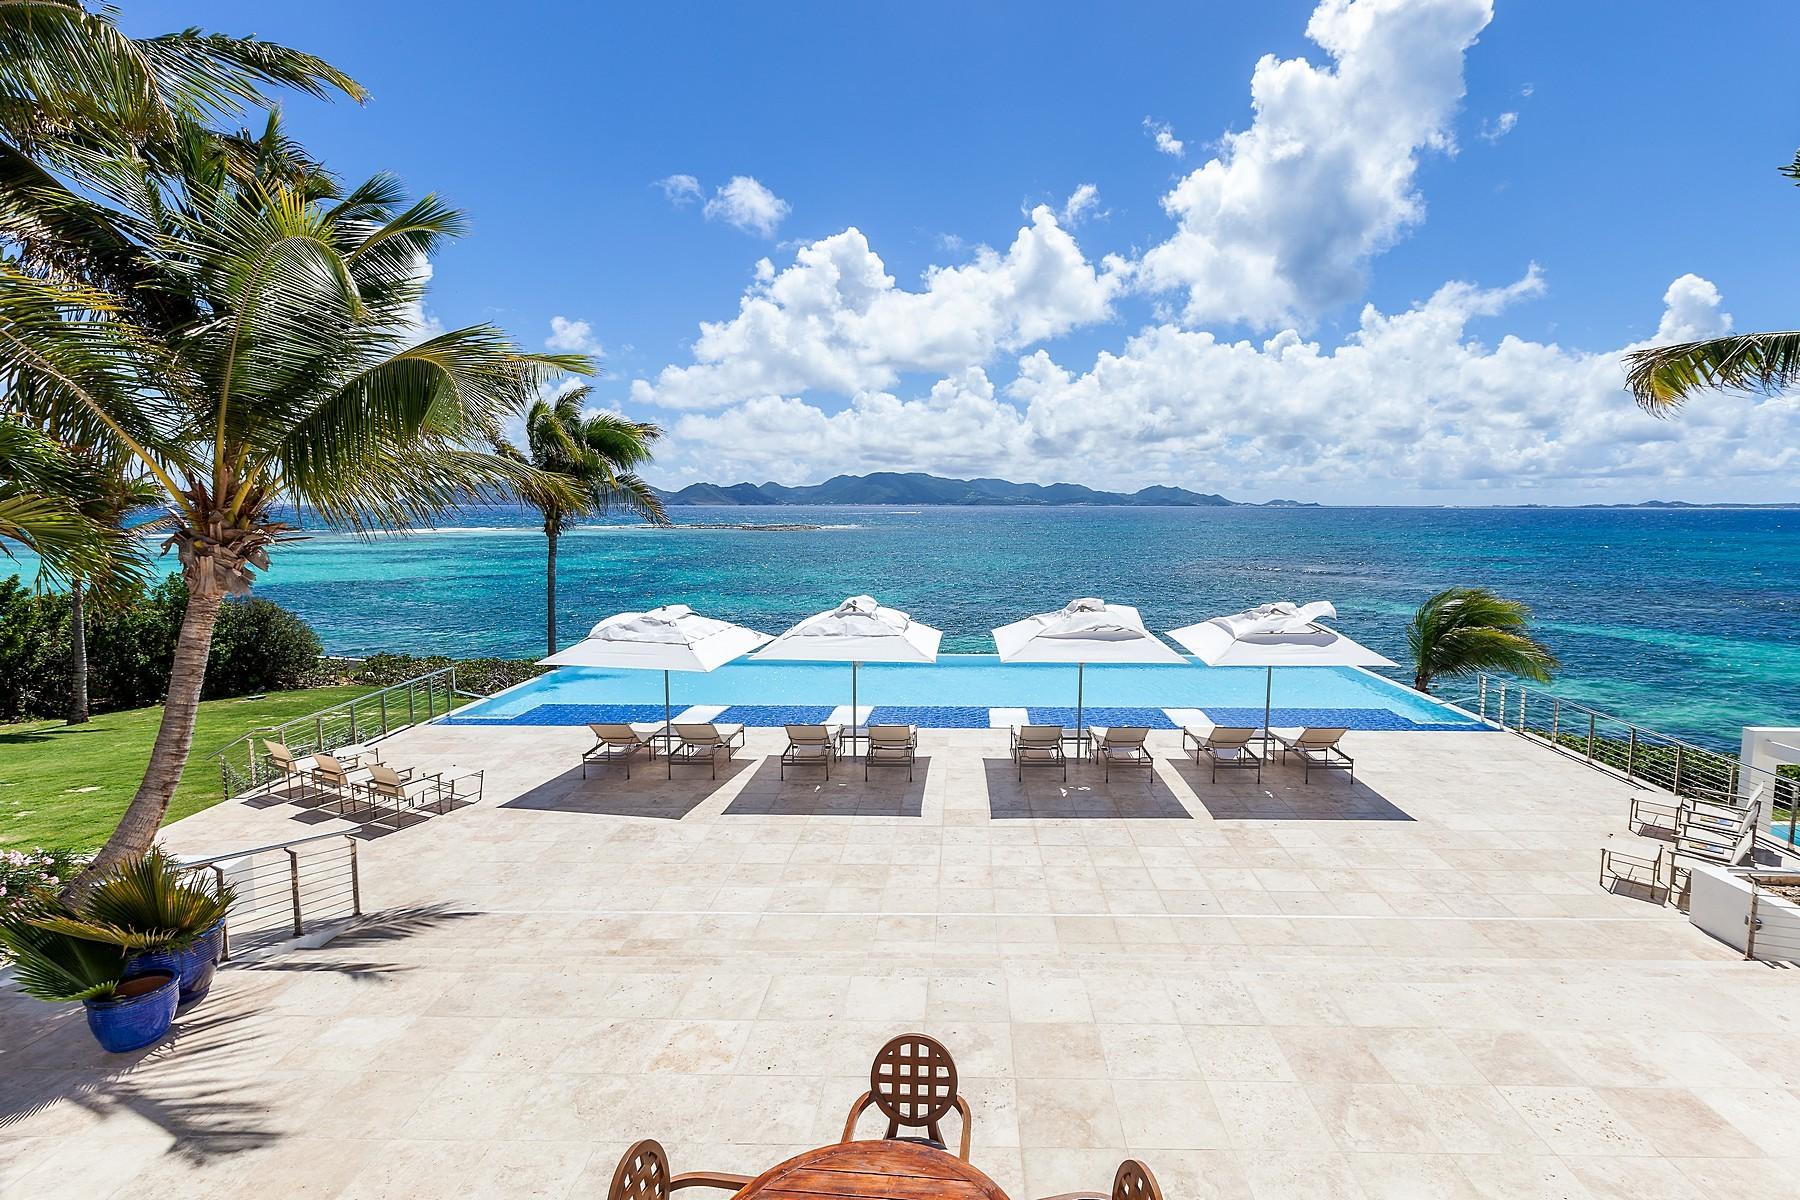 Imóvel para venda Other Anguilla